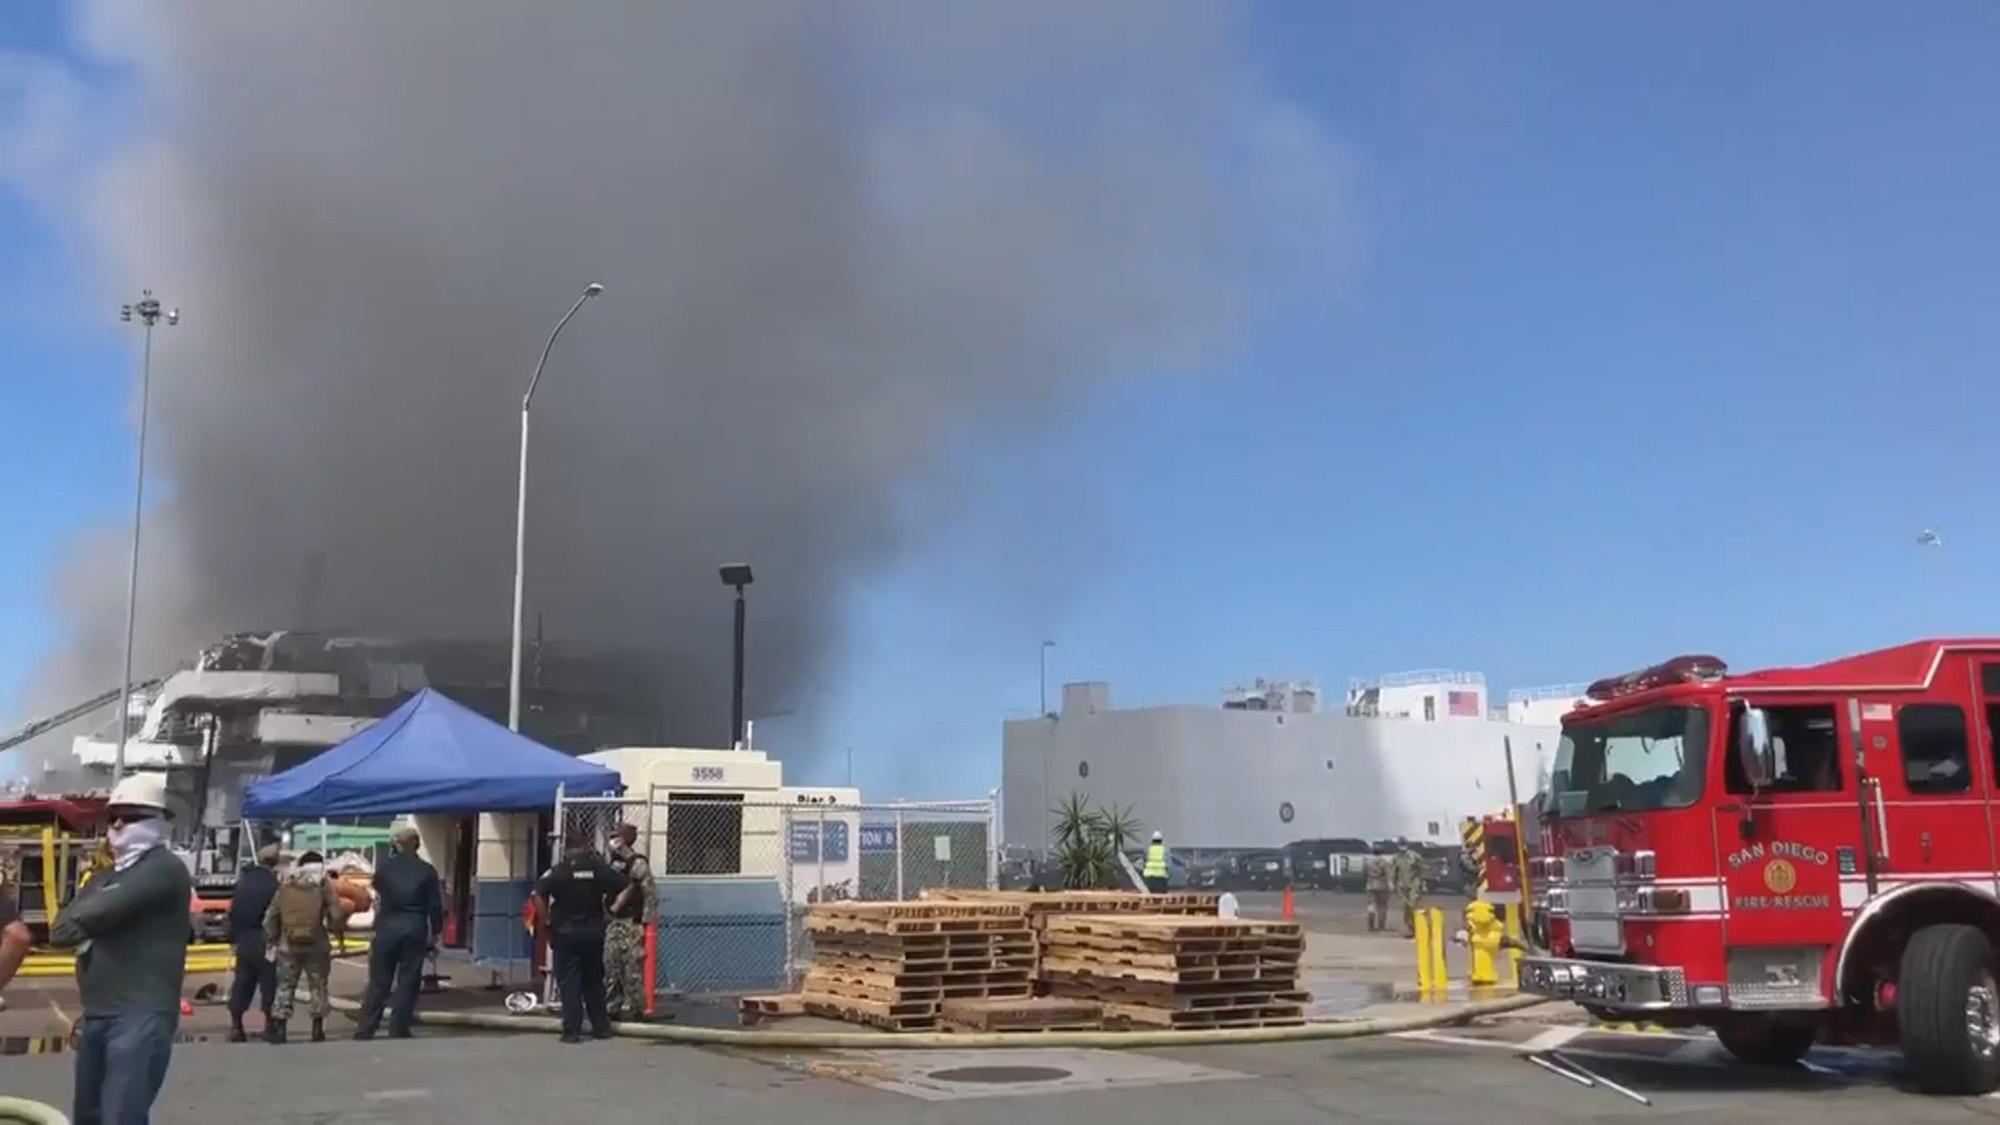 San Diego explosion injures 34 US sailors